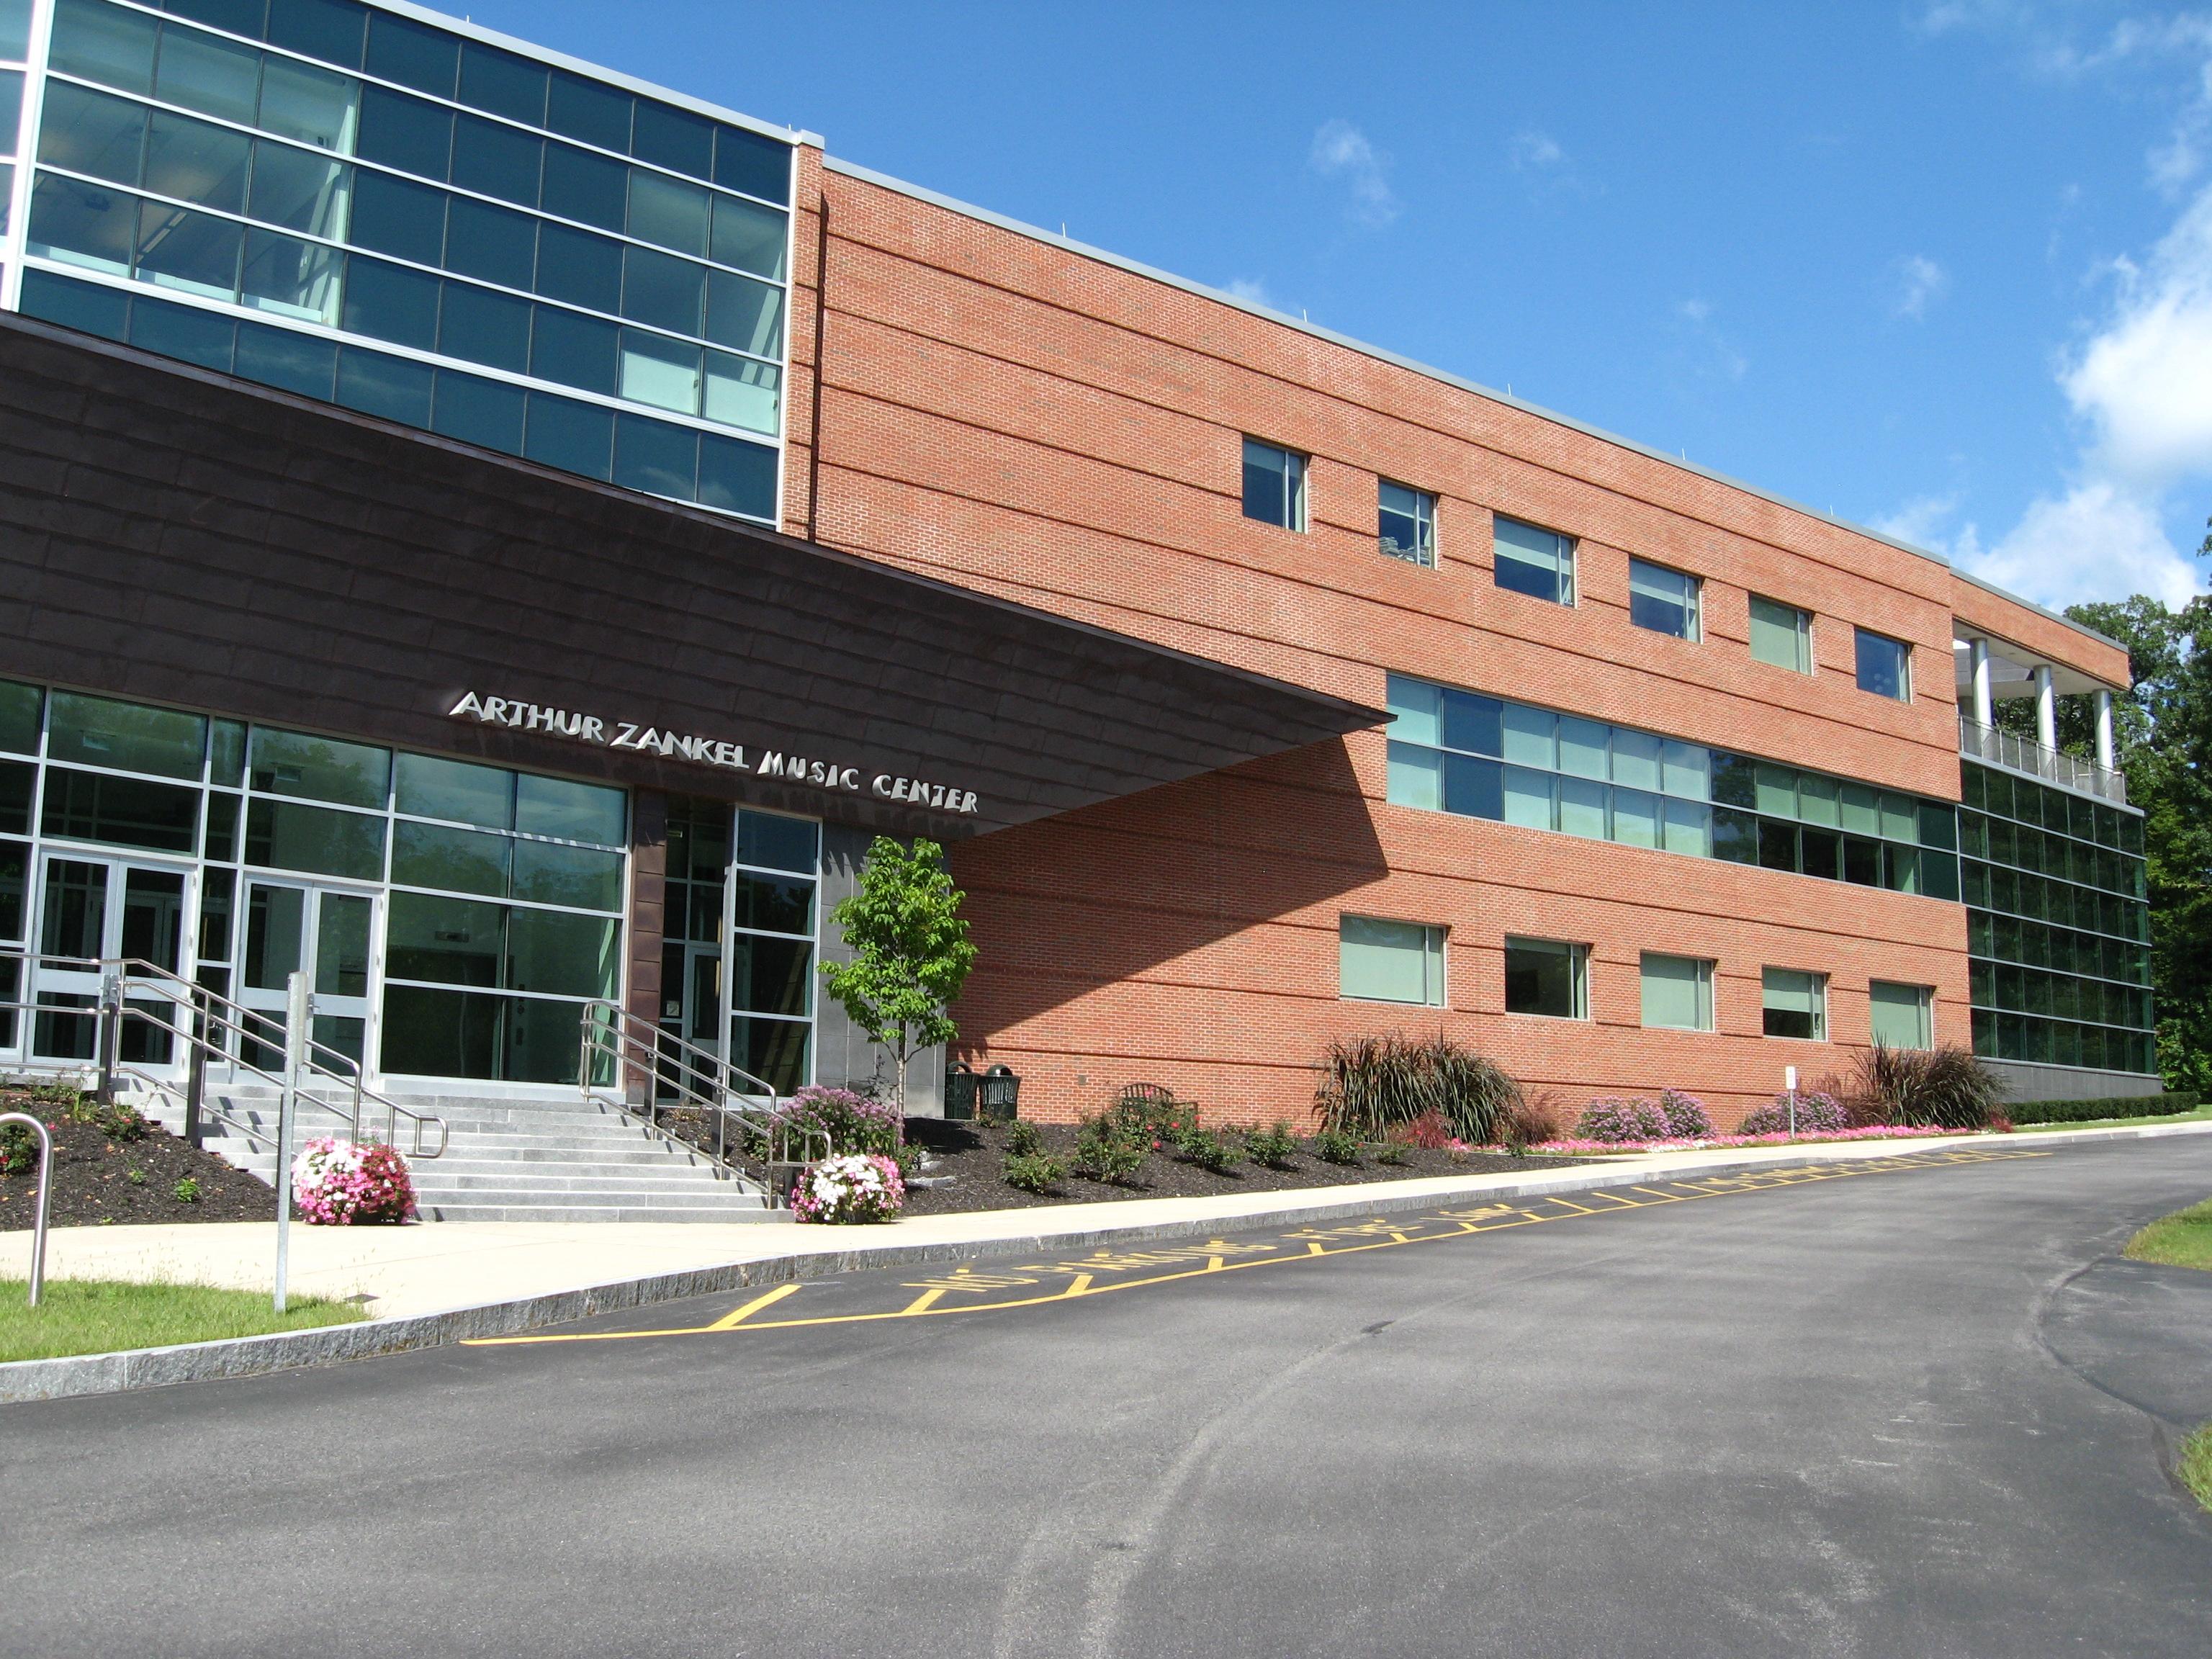 college springs 深泉学院位于美国加利福尼亚州的深泉山谷。学院建立于1917年,是一所私立的男校。深泉学院是美国最具声望及最挑剔的2年制高等学府之一。在学院完成2年的学习以后.